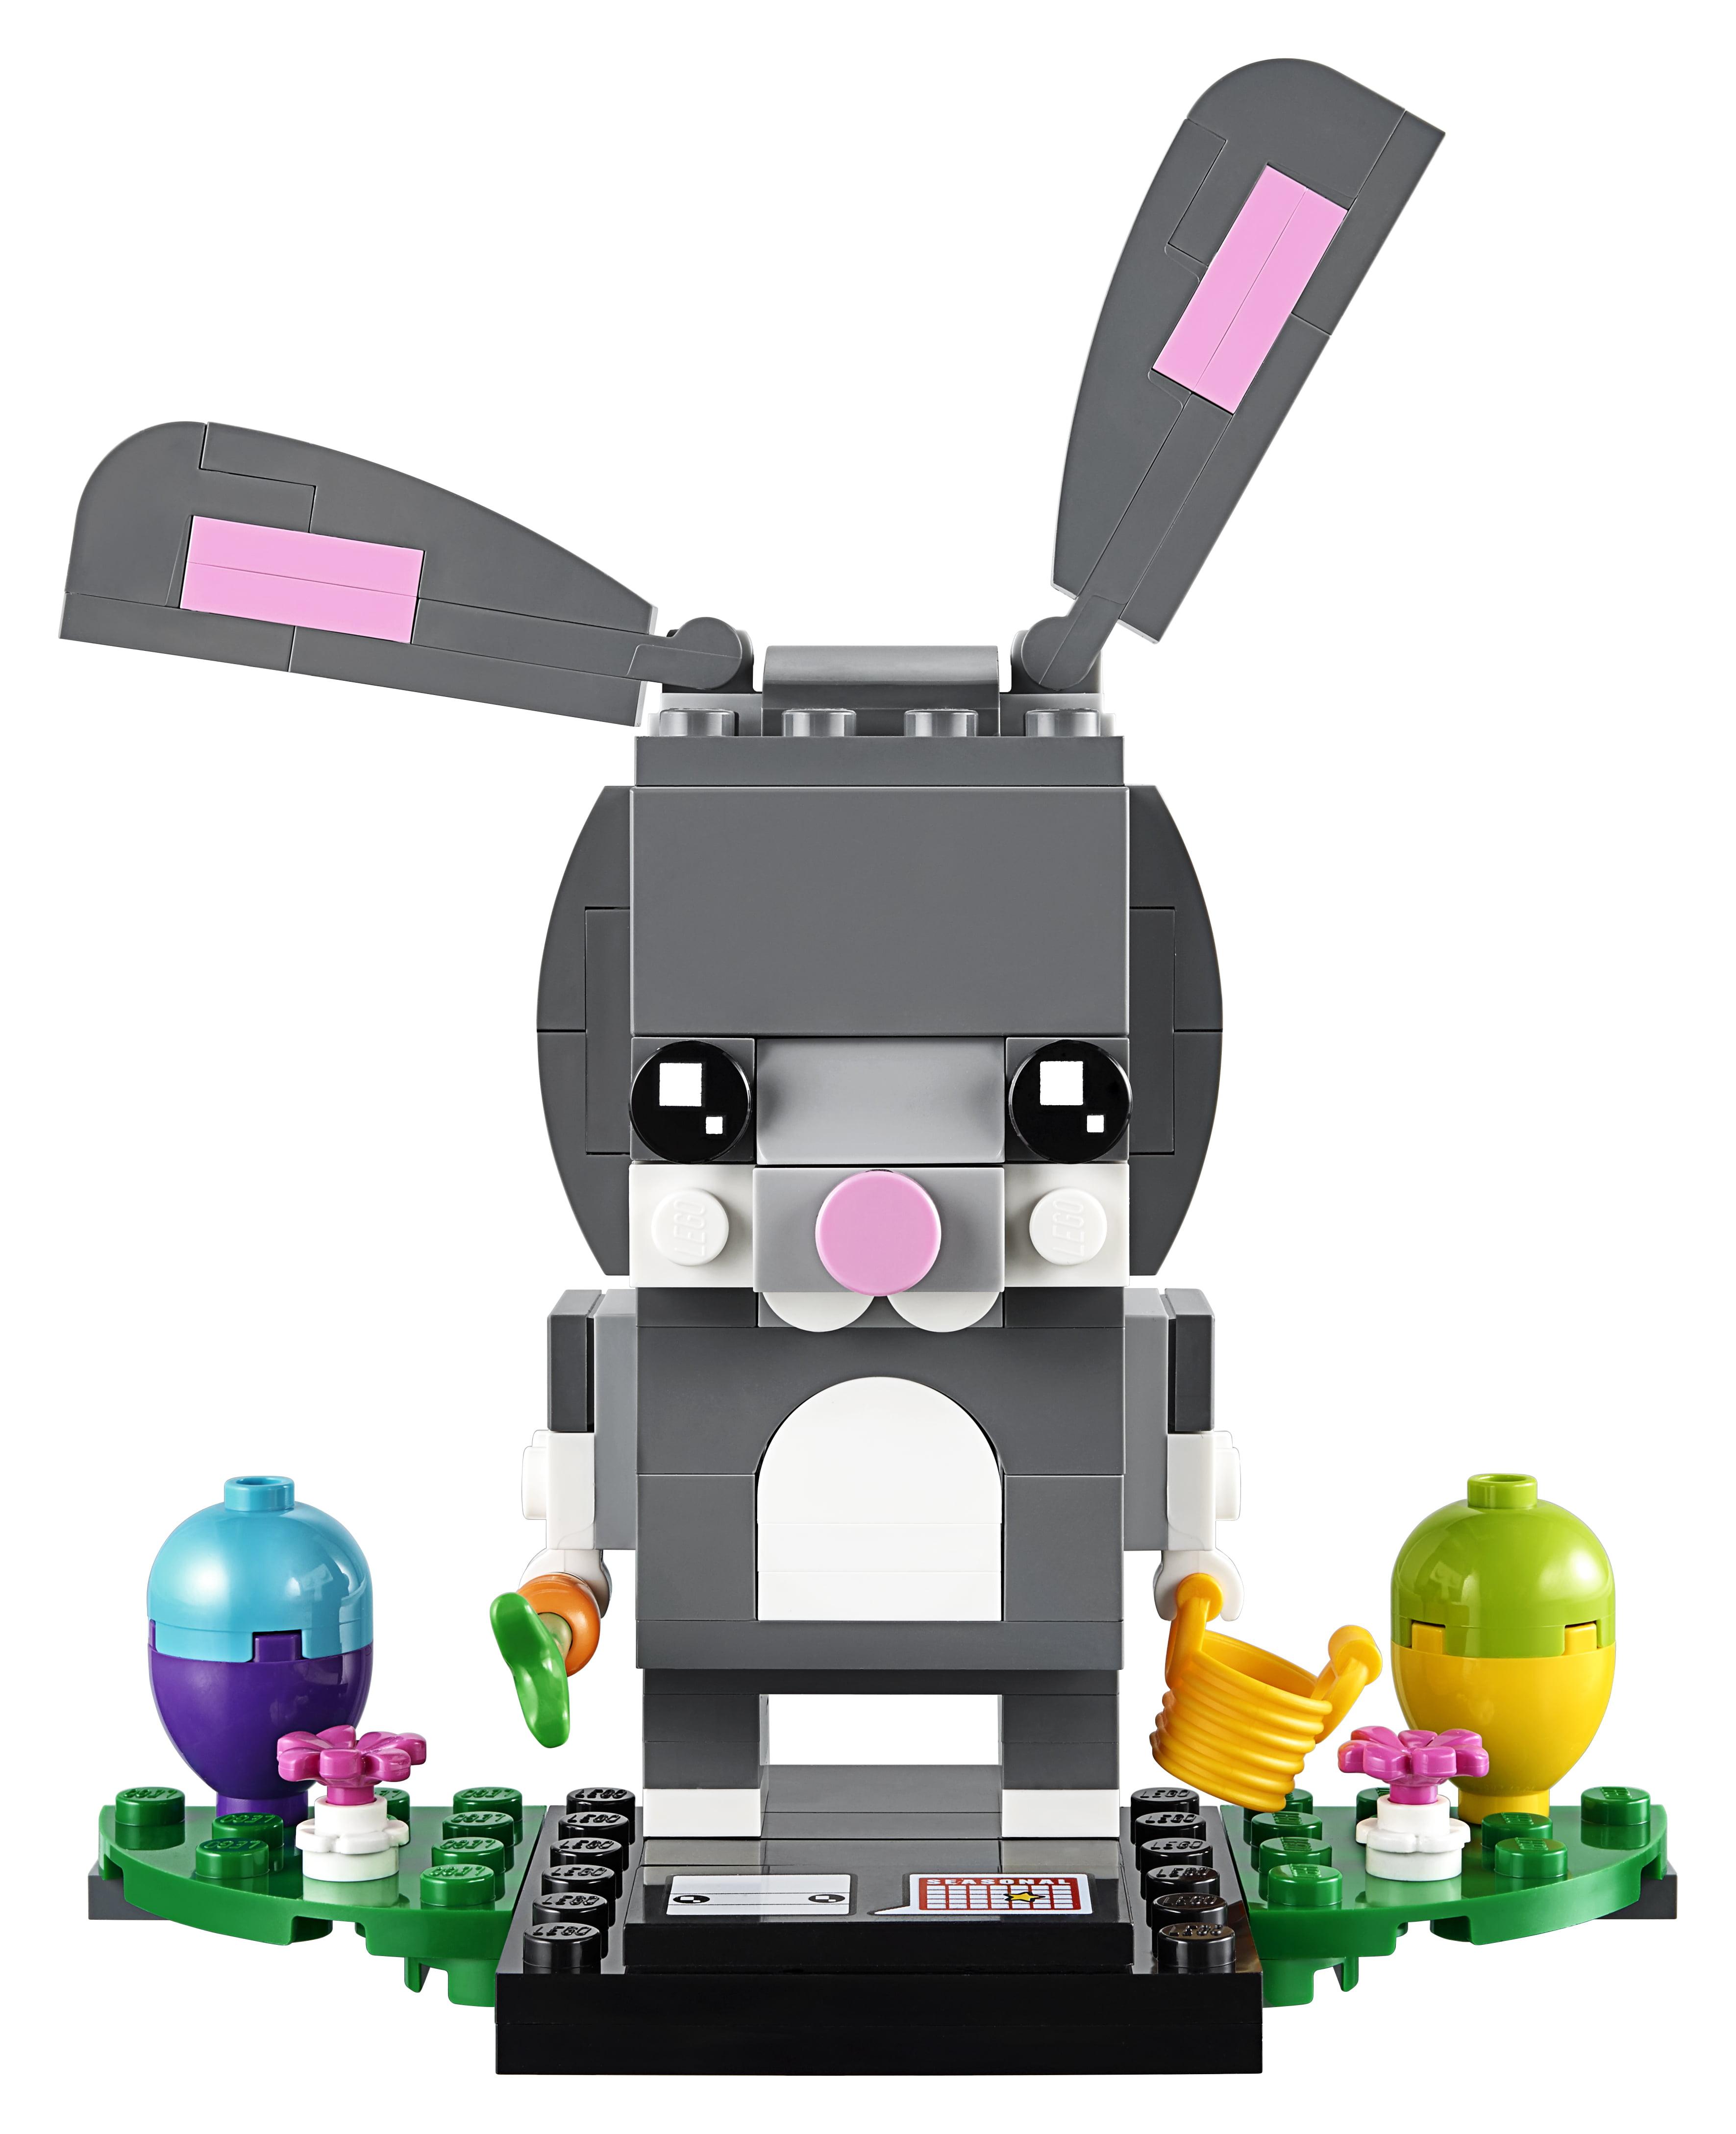 LEGO BrickHeadz Easter Bunny 40271 Building Set (126 Pieces)